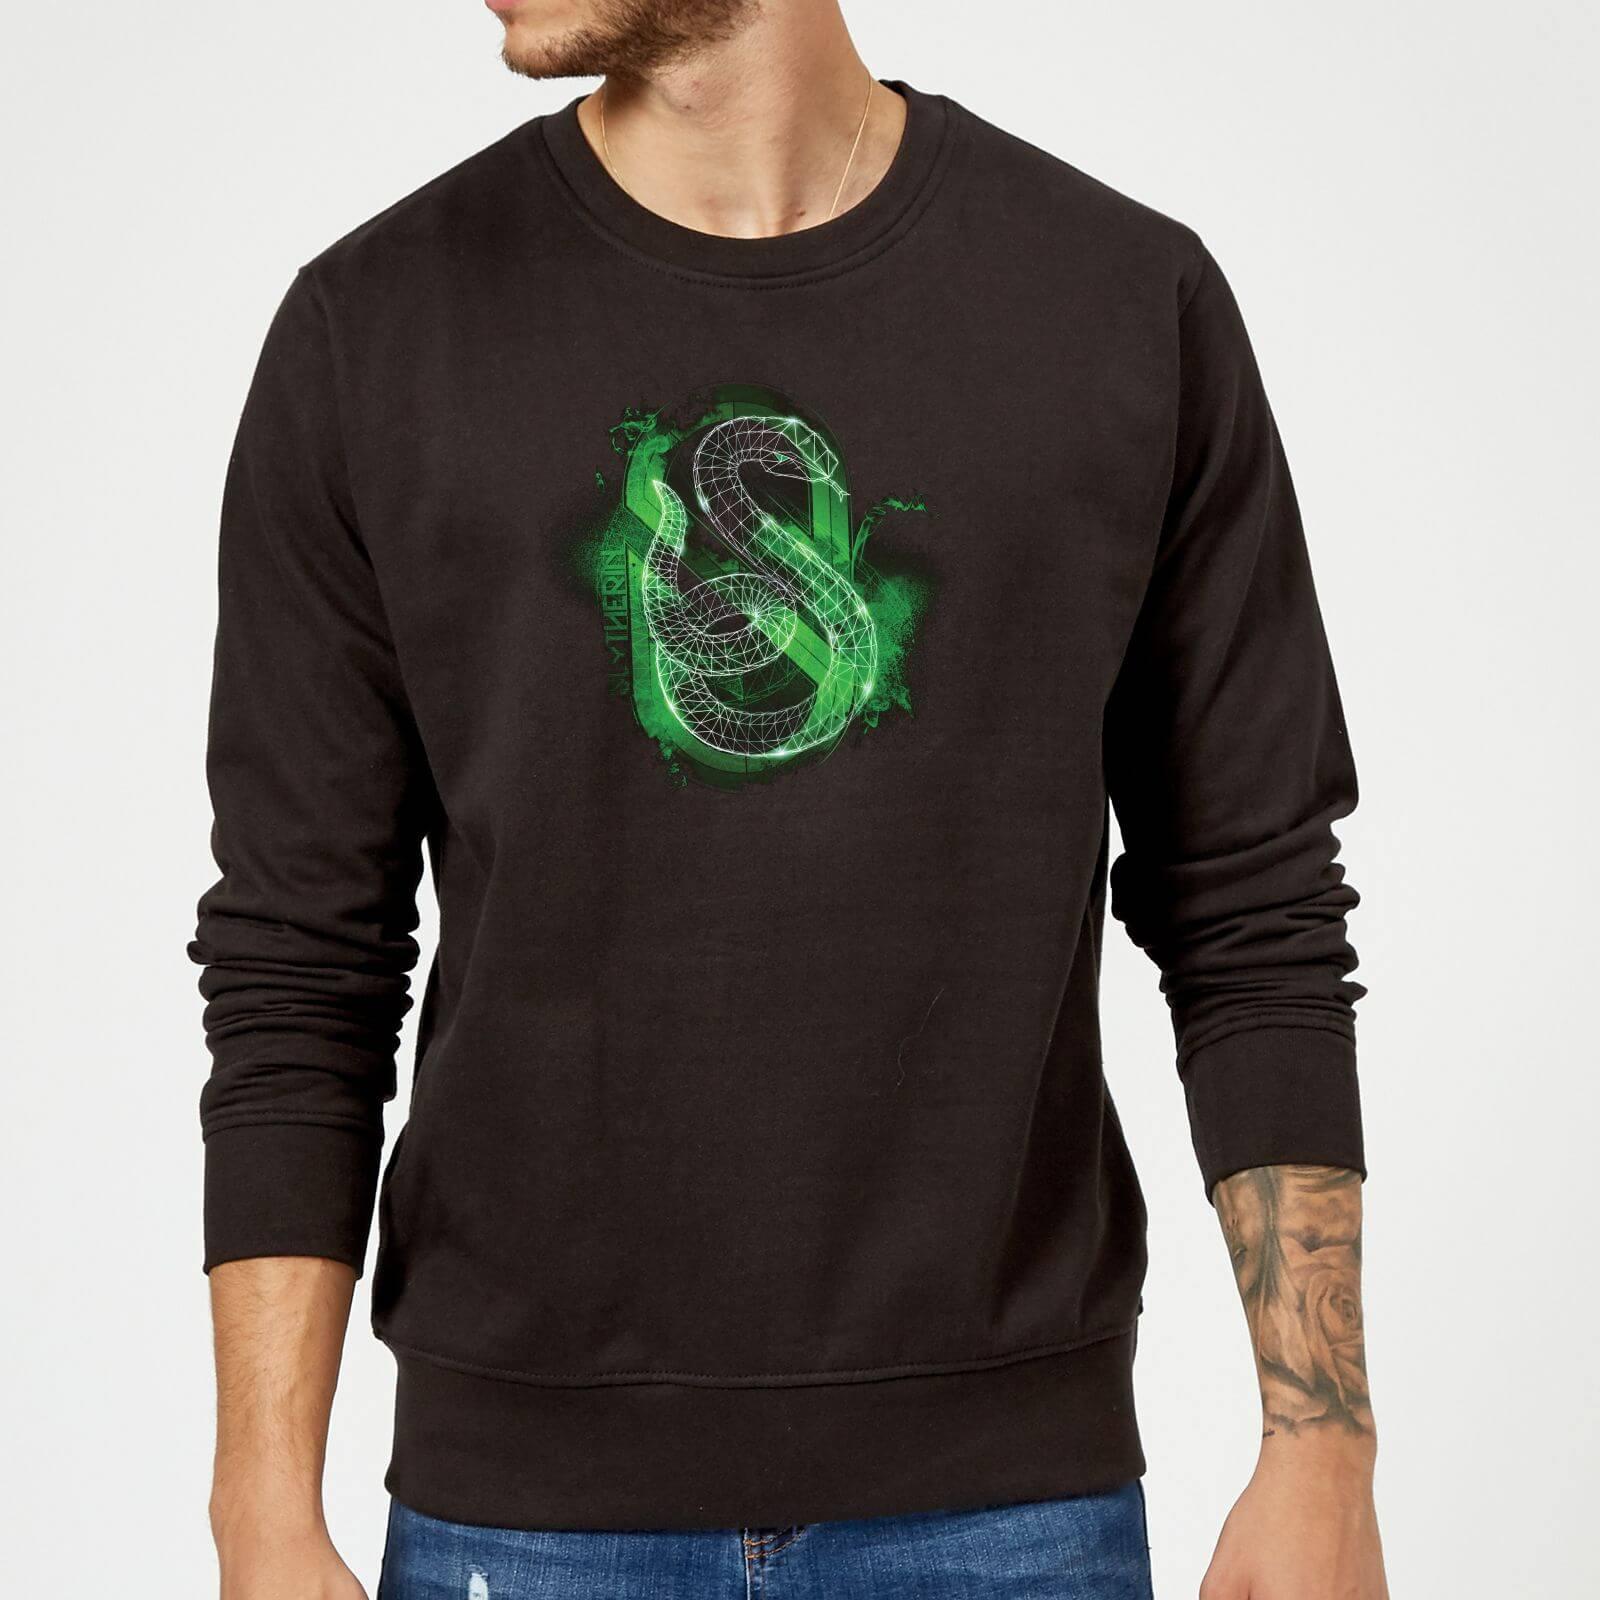 Harry Potter Slytherin Geometric Sweatshirt - Black - XXL - Black